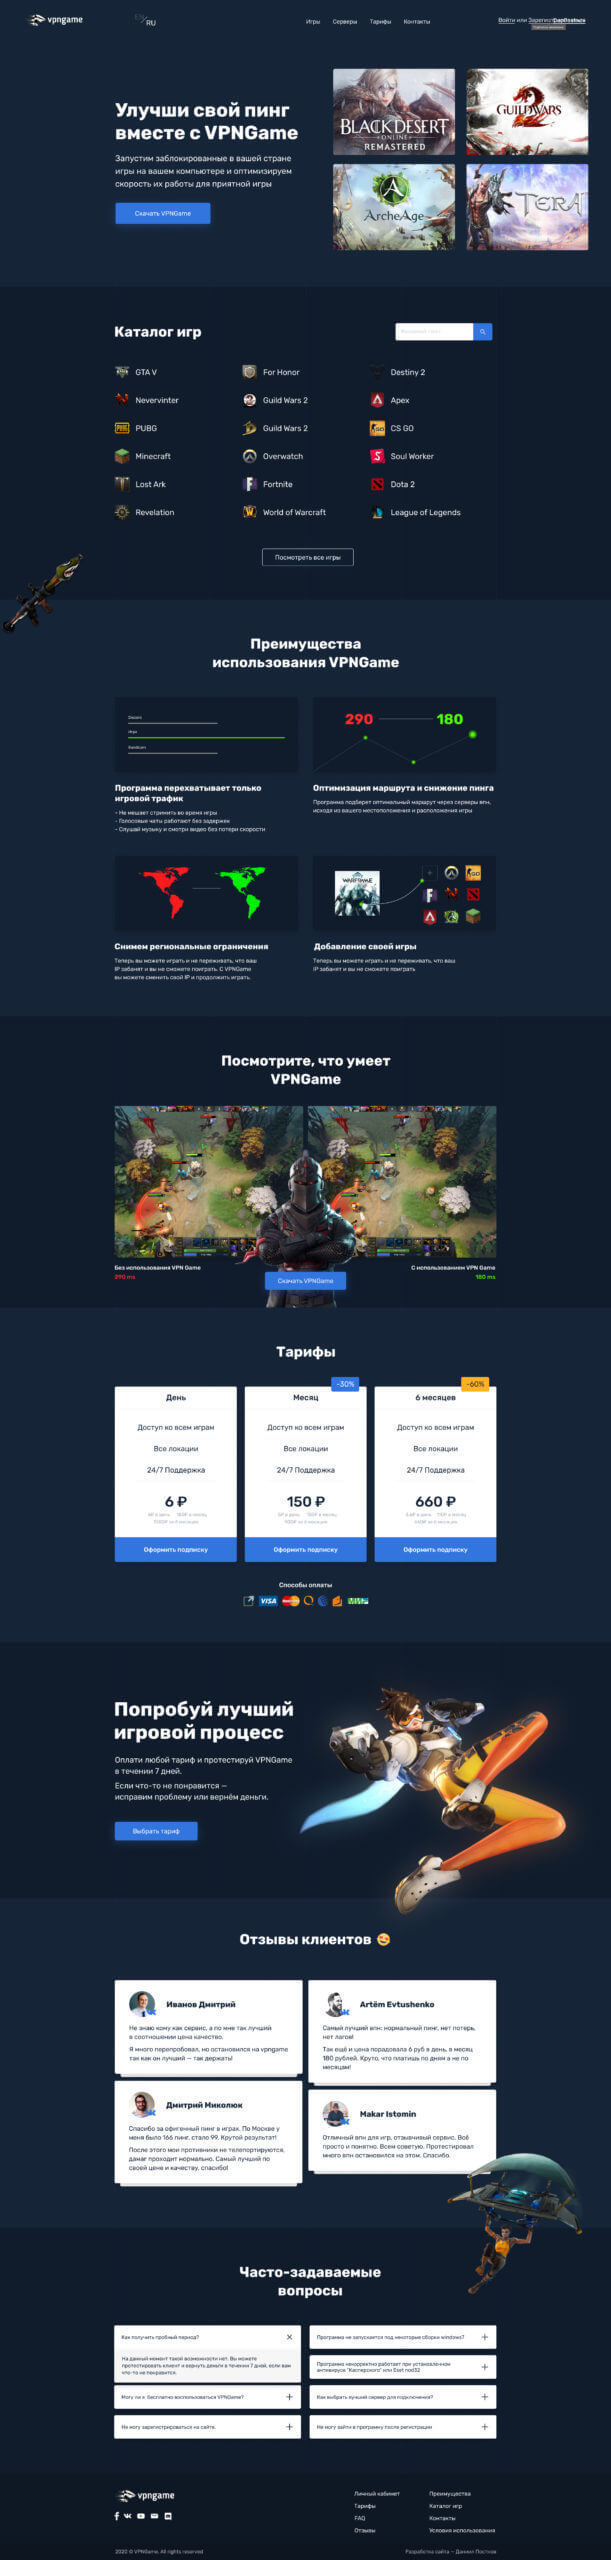 Дизайн и вёрстка проекта VPNGame 31